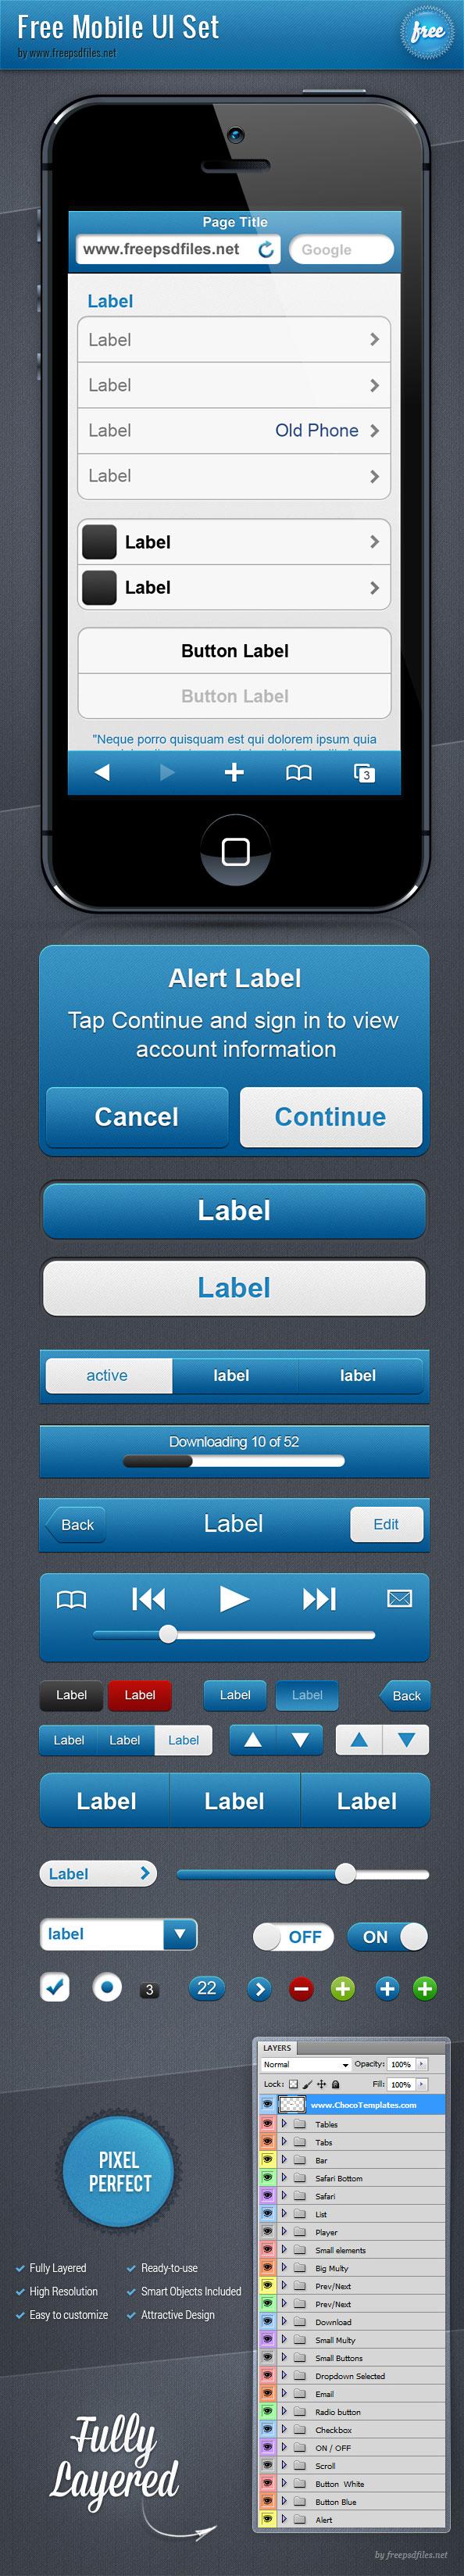 Mobile UI Free PSD Set